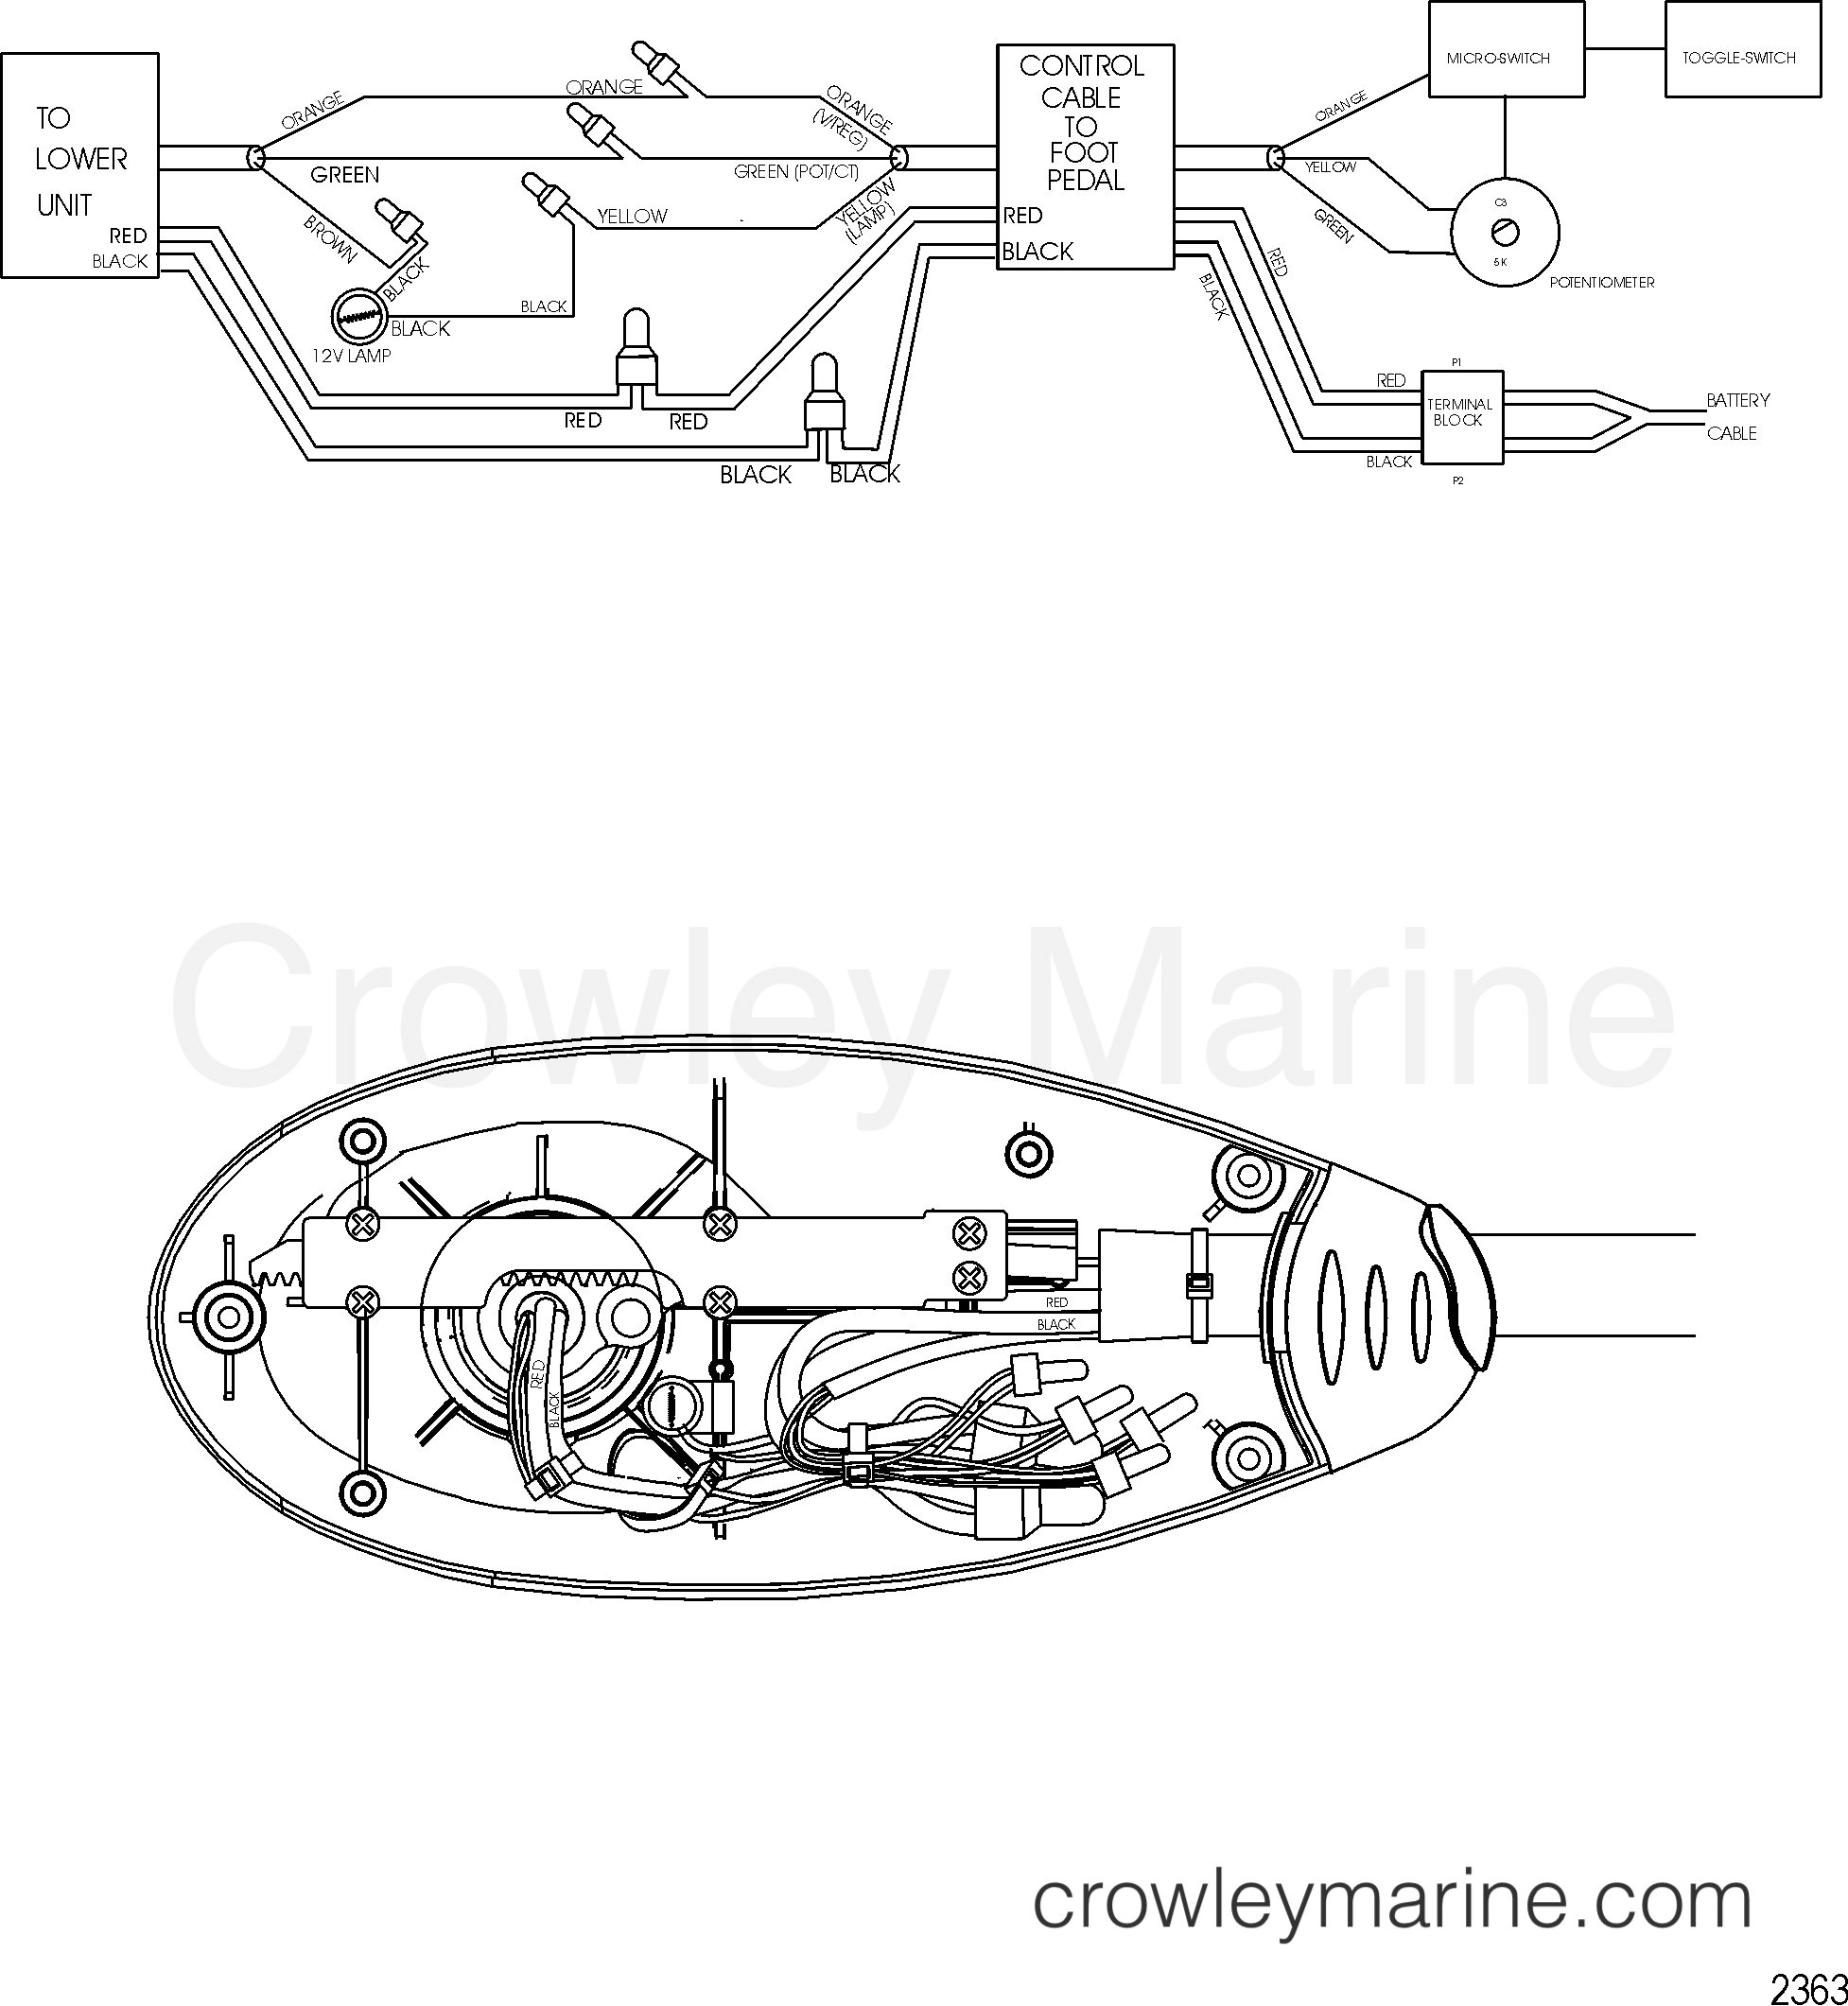 2005 MotorGuide 12V [MOTORGUIDE] - 921310040 WIRE DIAGRAM(MODEL FW71FBD) section